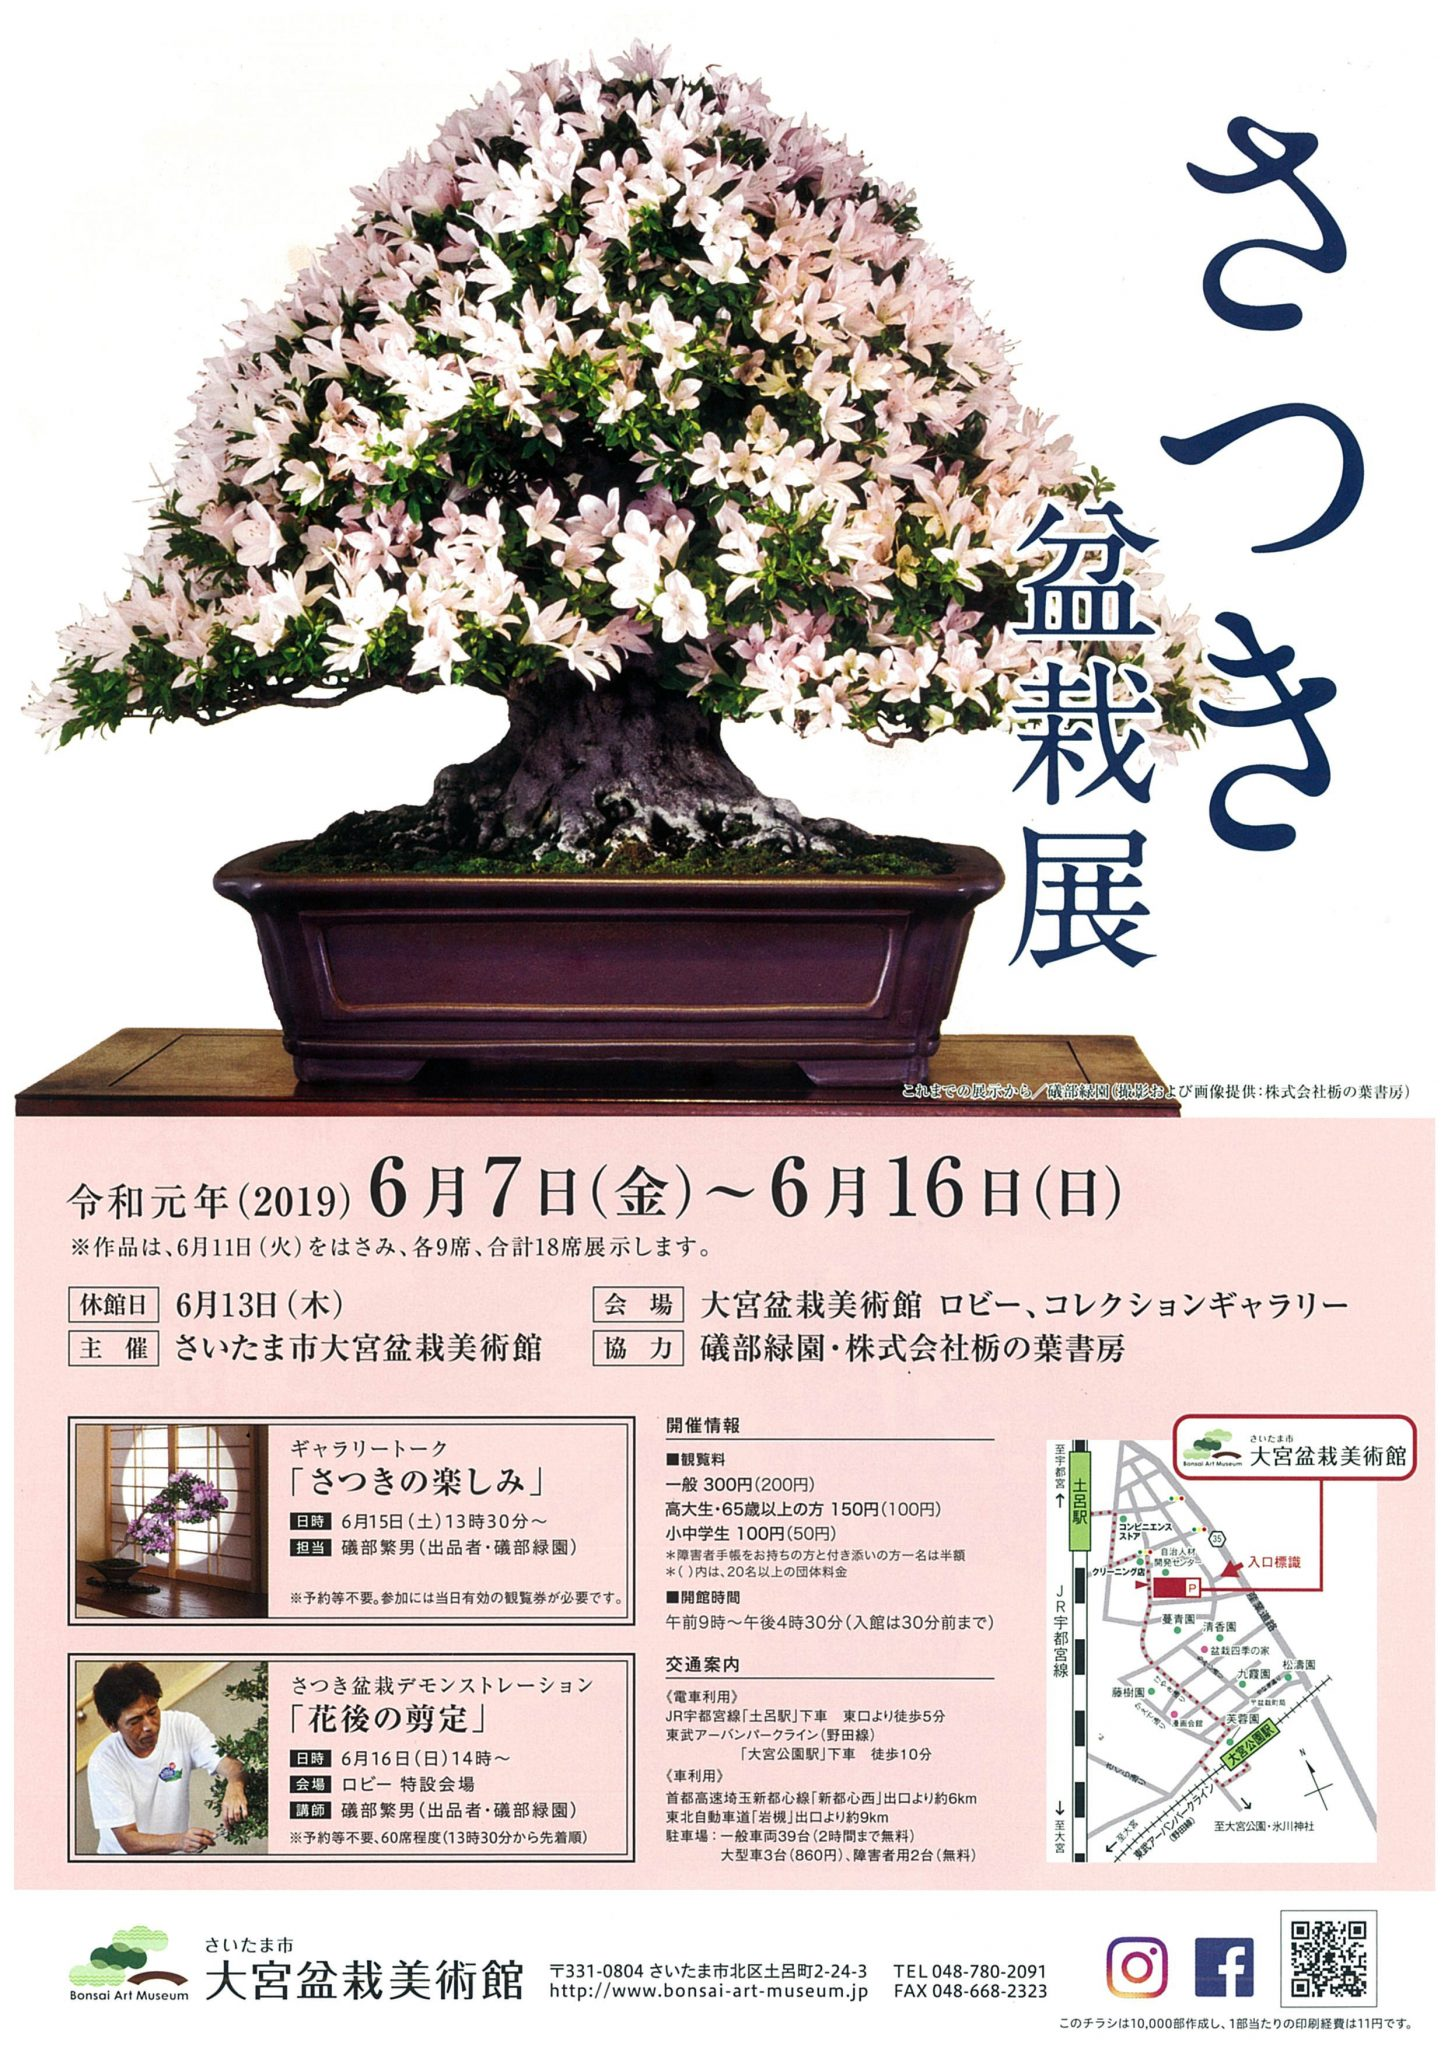 Satsuki Azalea Bonsai Exhibition